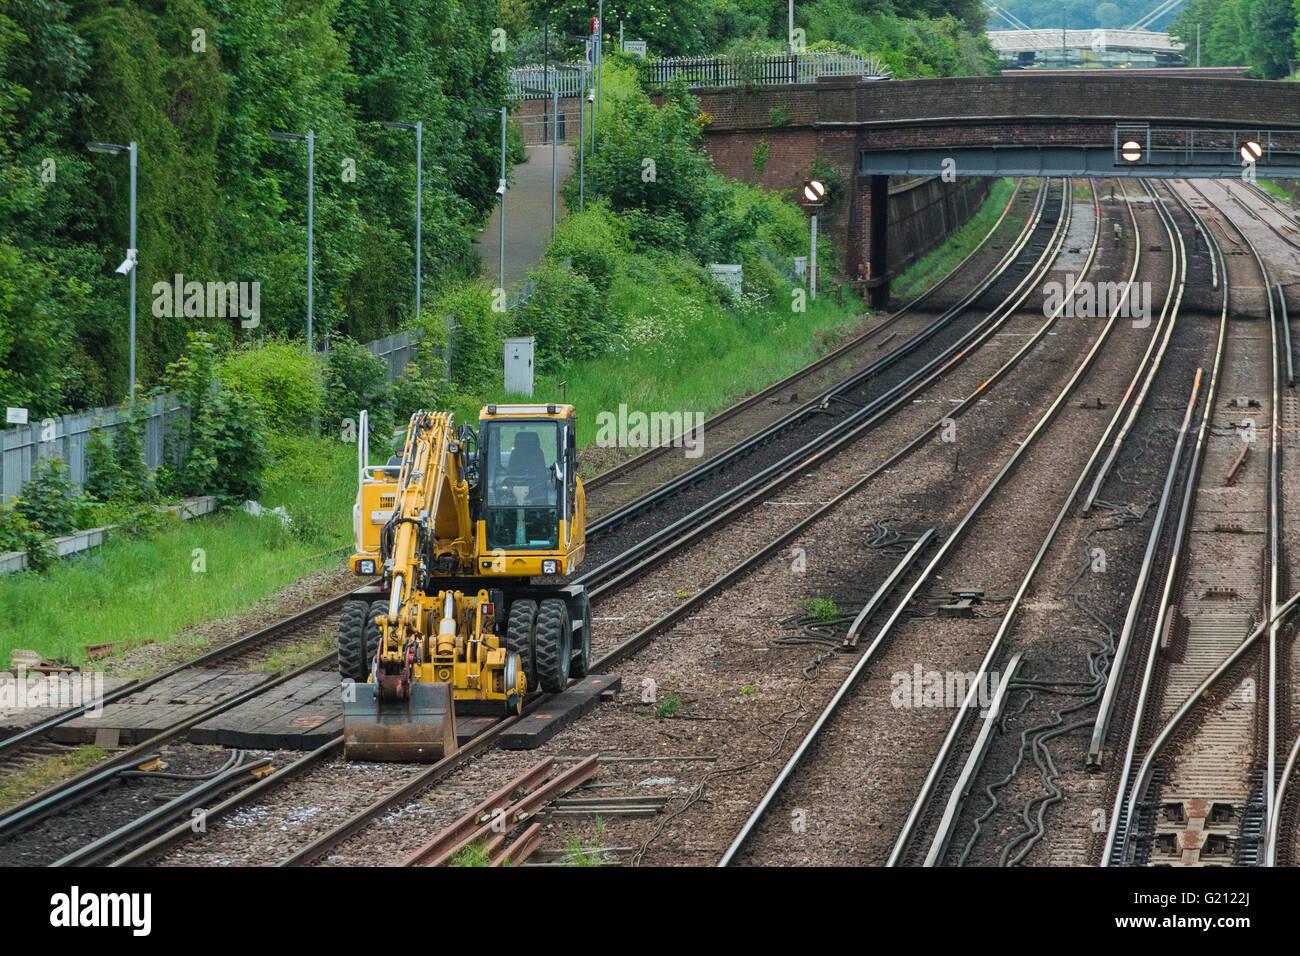 Caterpillar on the train line - Stock Image